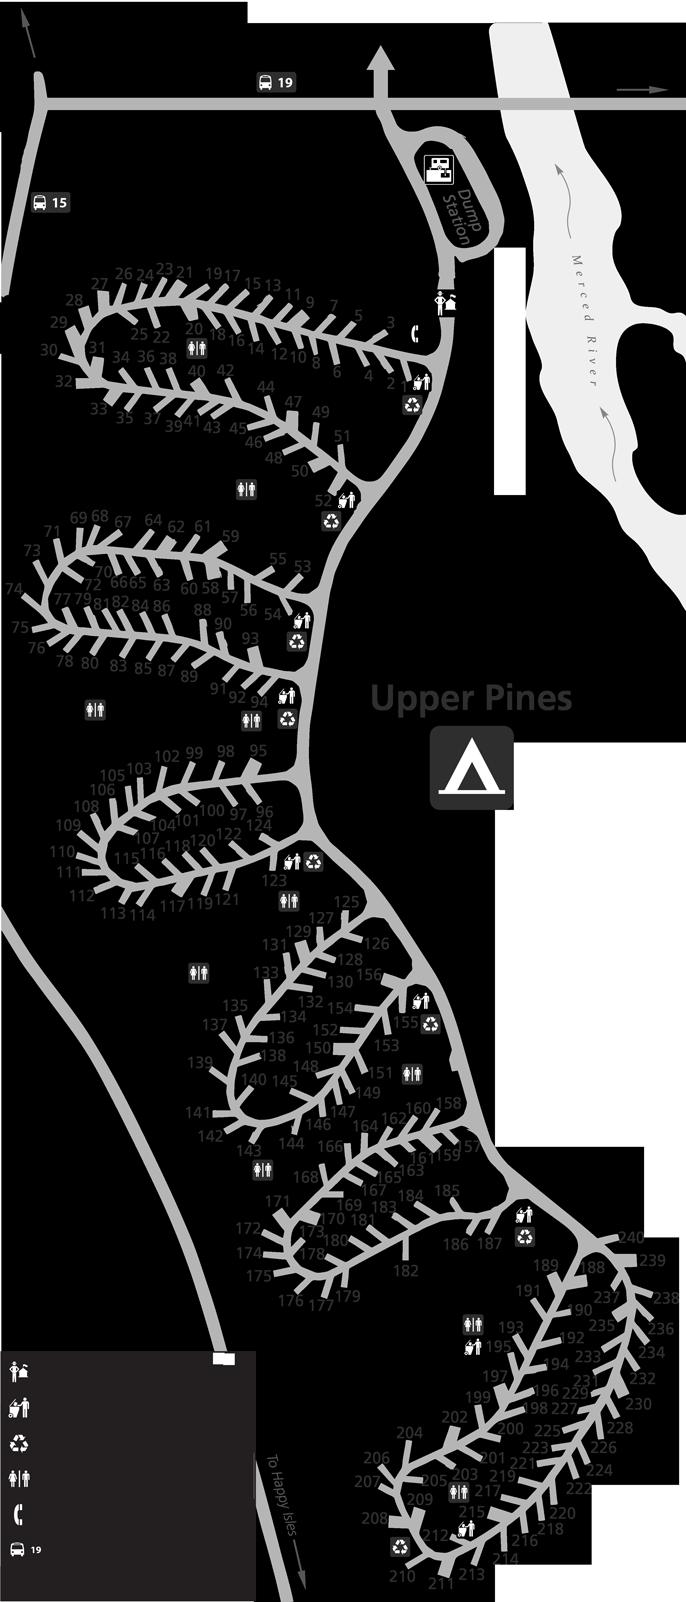 Upper Pines Campground In Yosemite Yosemite Camping